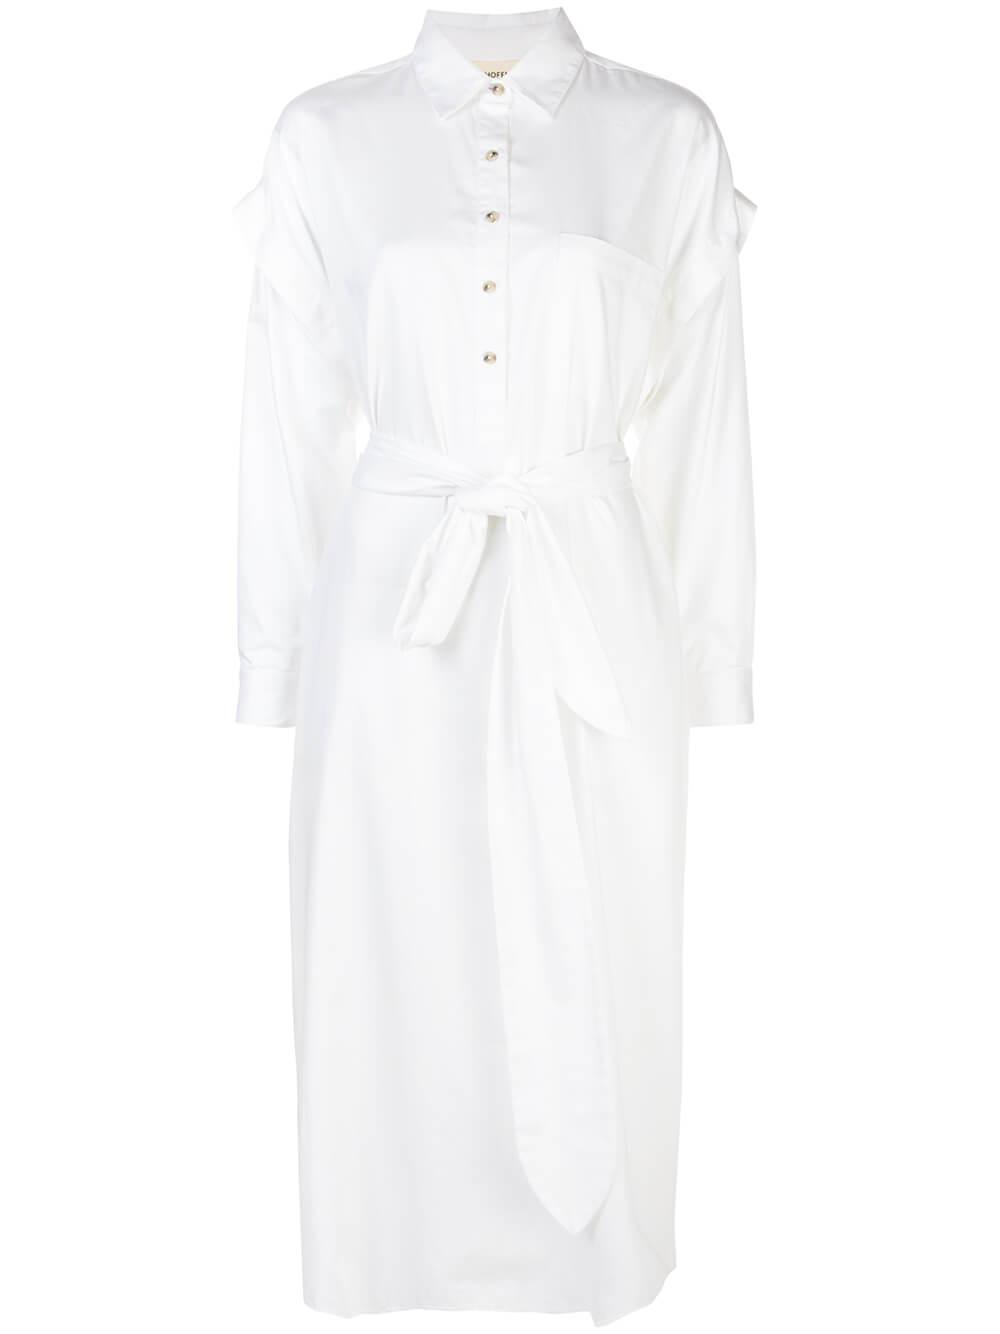 Cameron Cotton Removable Sleeve Dress Item # W012211720